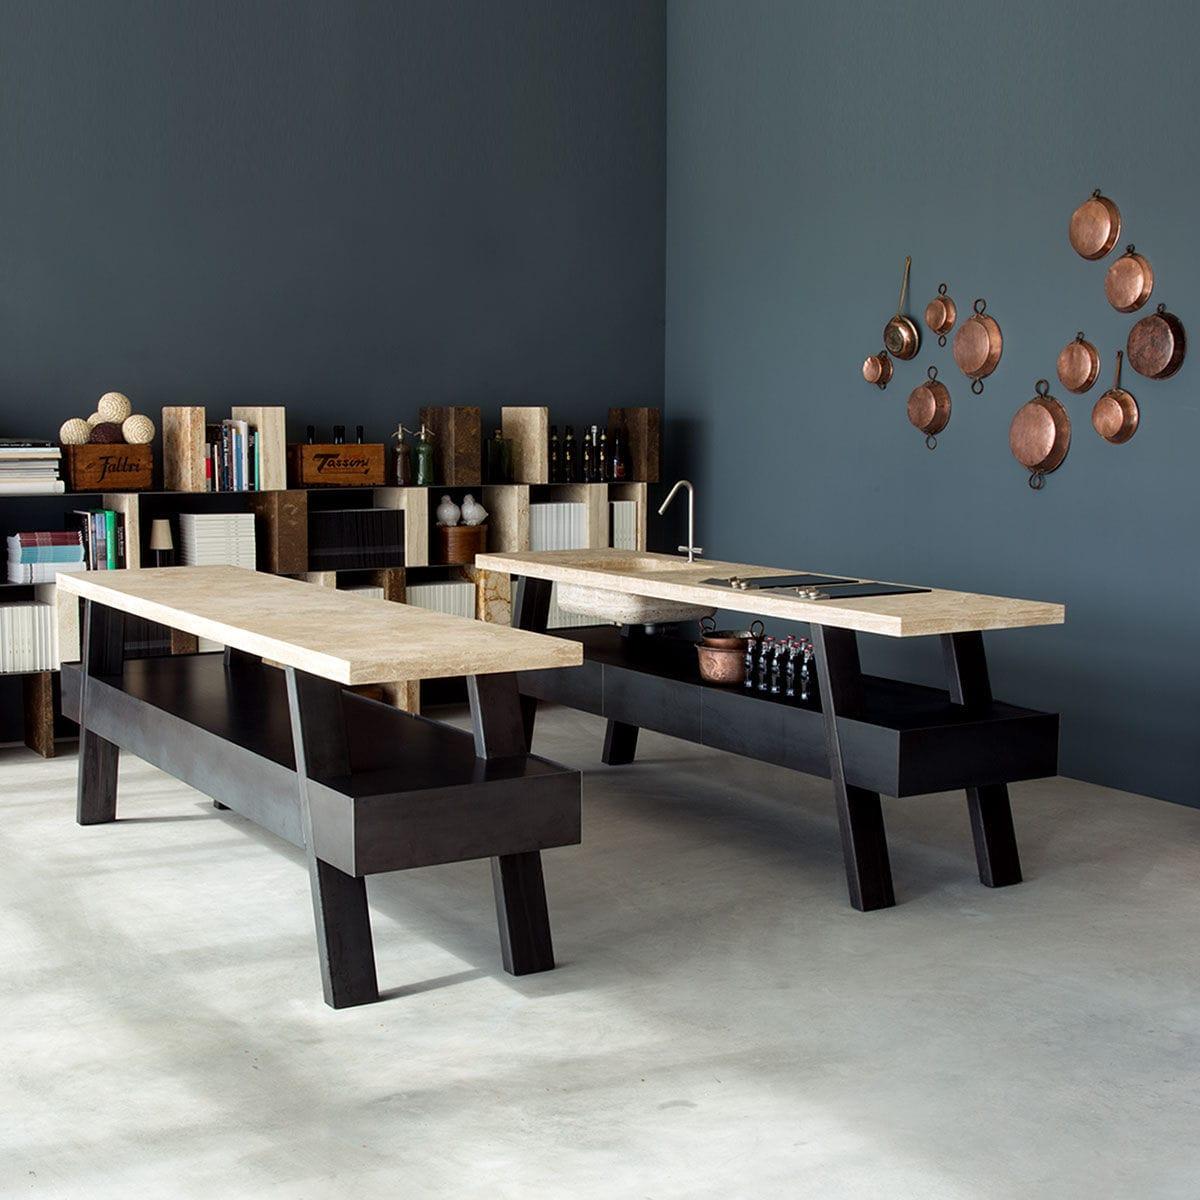 Freestanding Kitchen Unit Sider By Marco W Ioli Emanuel Gargano